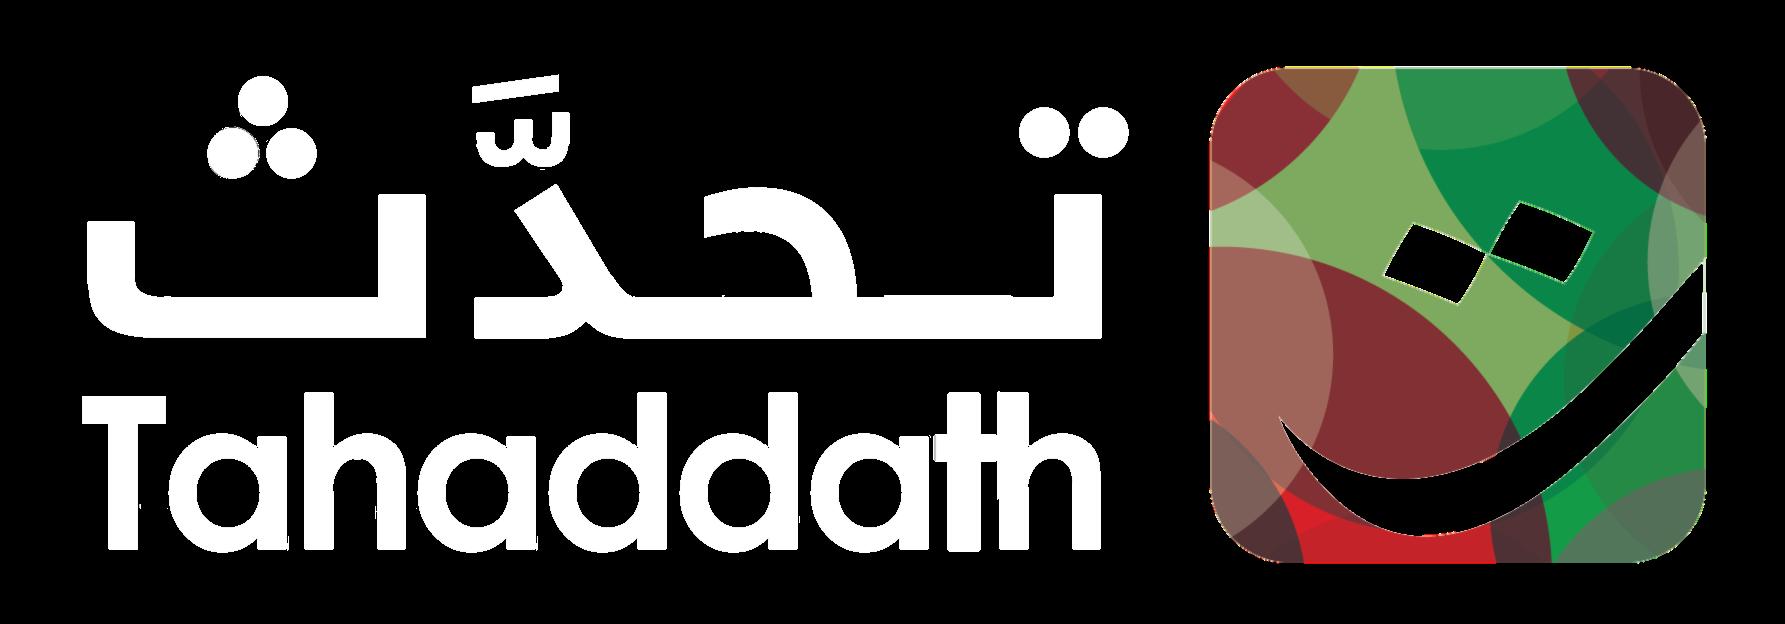 TAHADDATH